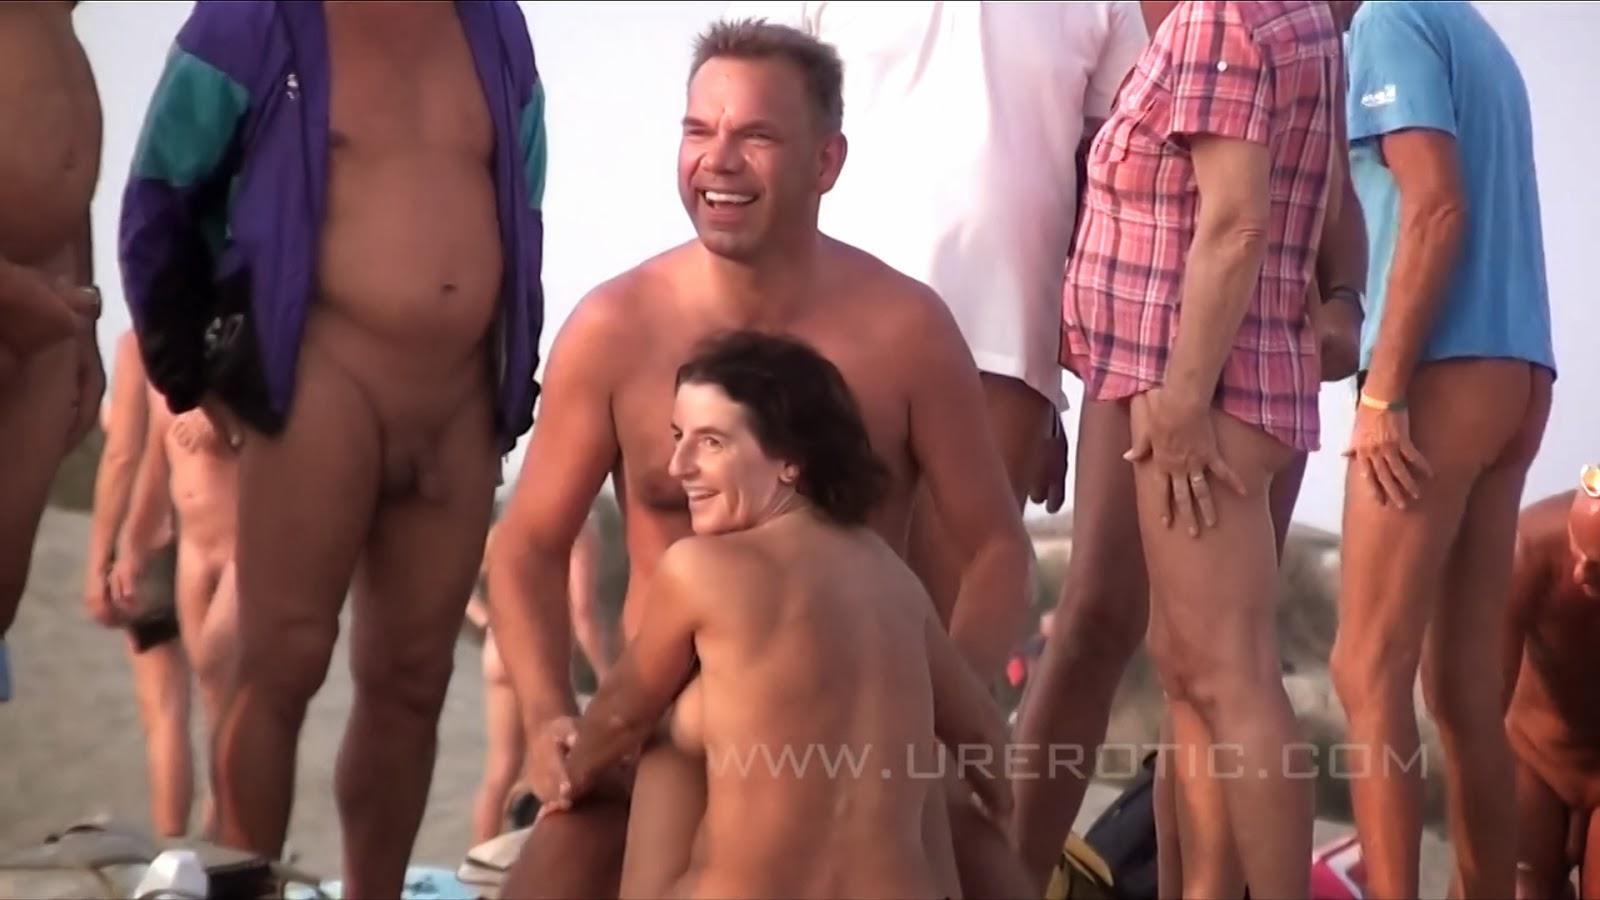 gay søger en bolleven glat dick